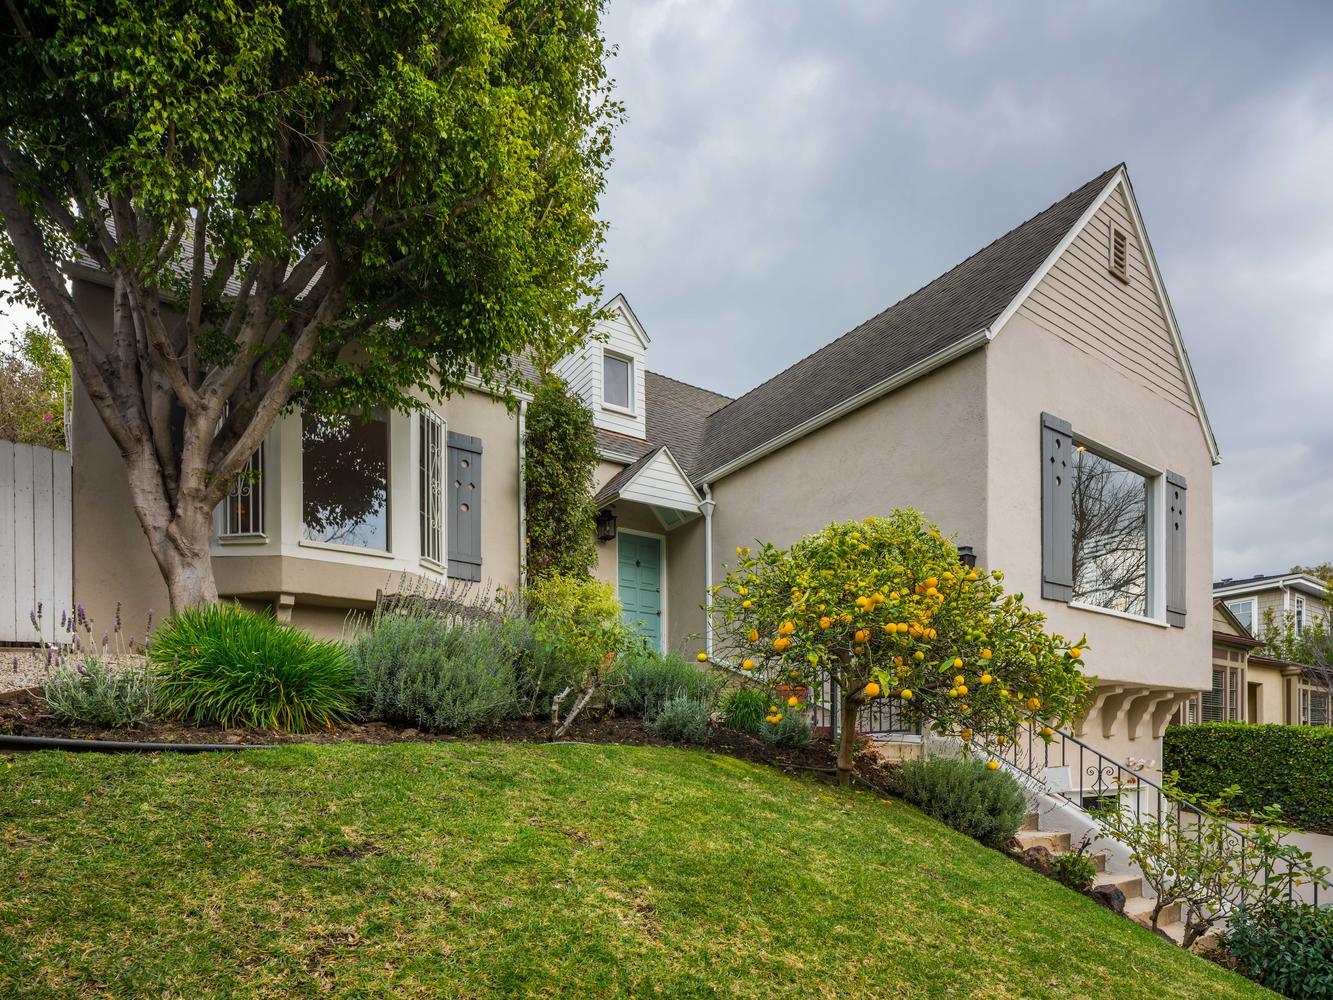 10558 Putney Rd Los Angeles CA-large-002-3-Exterior-1334x1000-72dpi.jpg